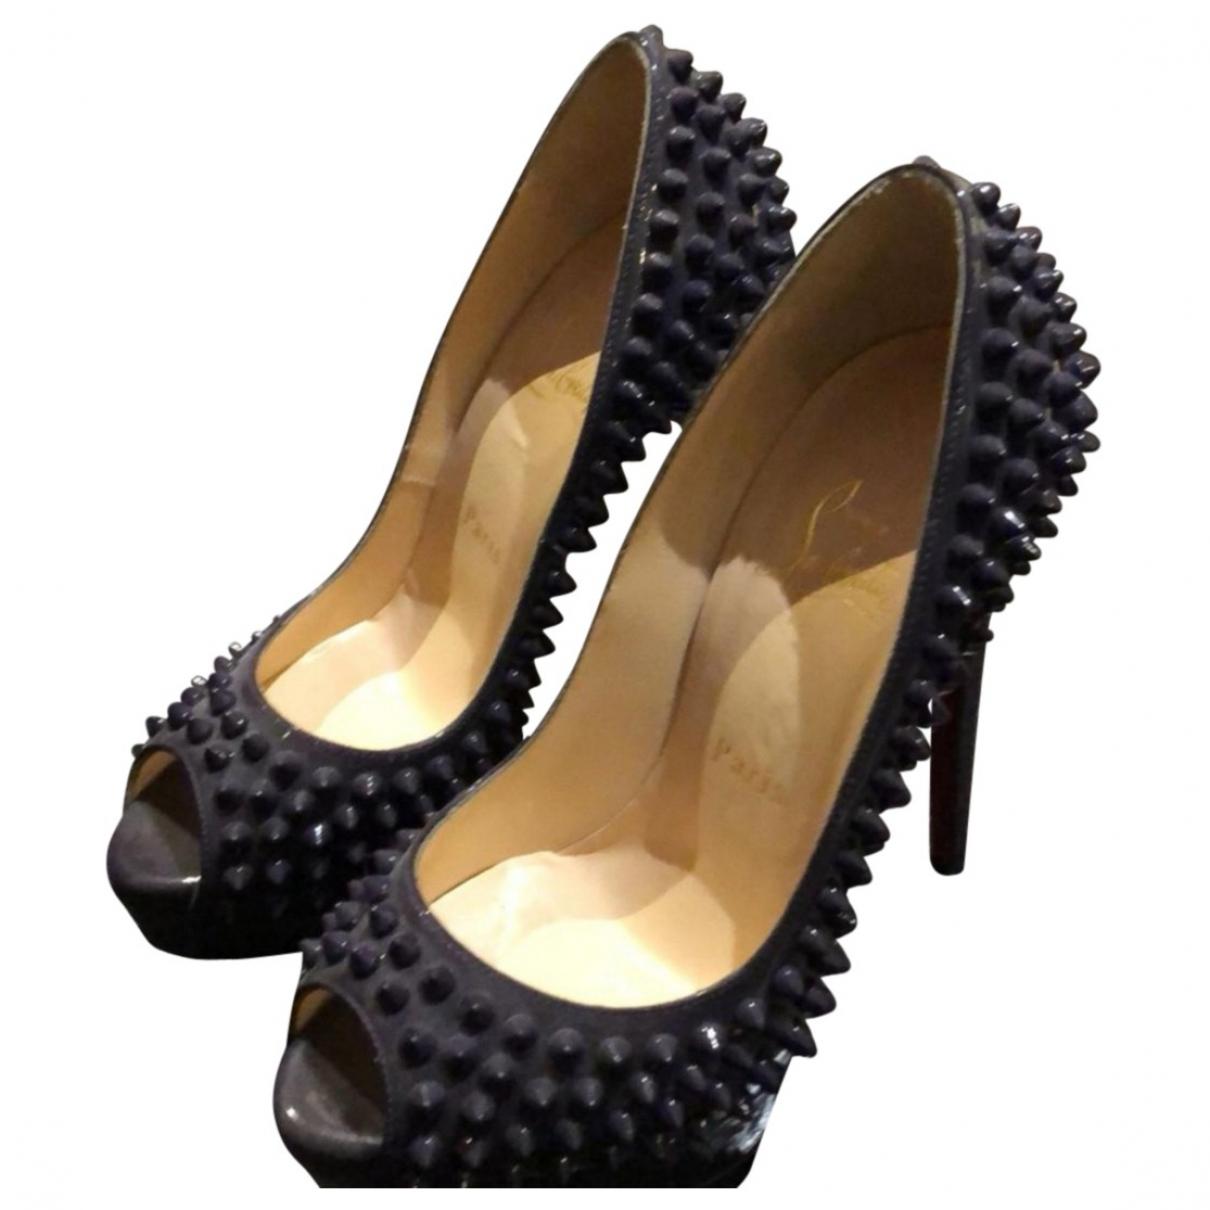 Christian Louboutin Lady Peep Patent leather Heels for Women 36 EU